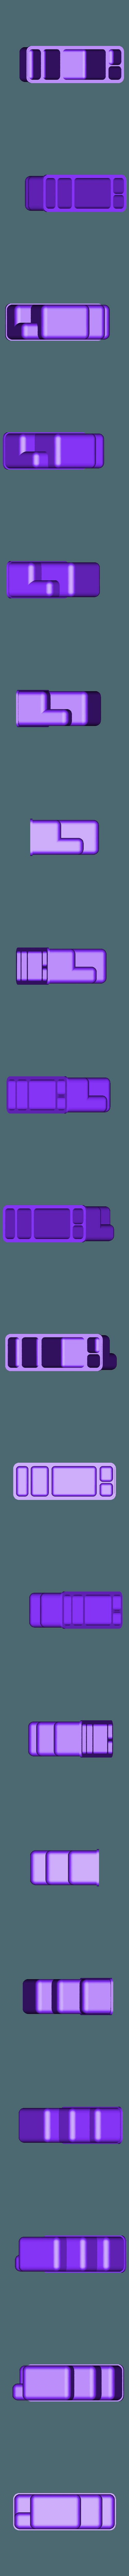 bigbusbox.stl Download free STL file London Bus Doubledeck Routemaster desk organizer (Boite à crayon bus anglais) • 3D printing object, Martymcflay